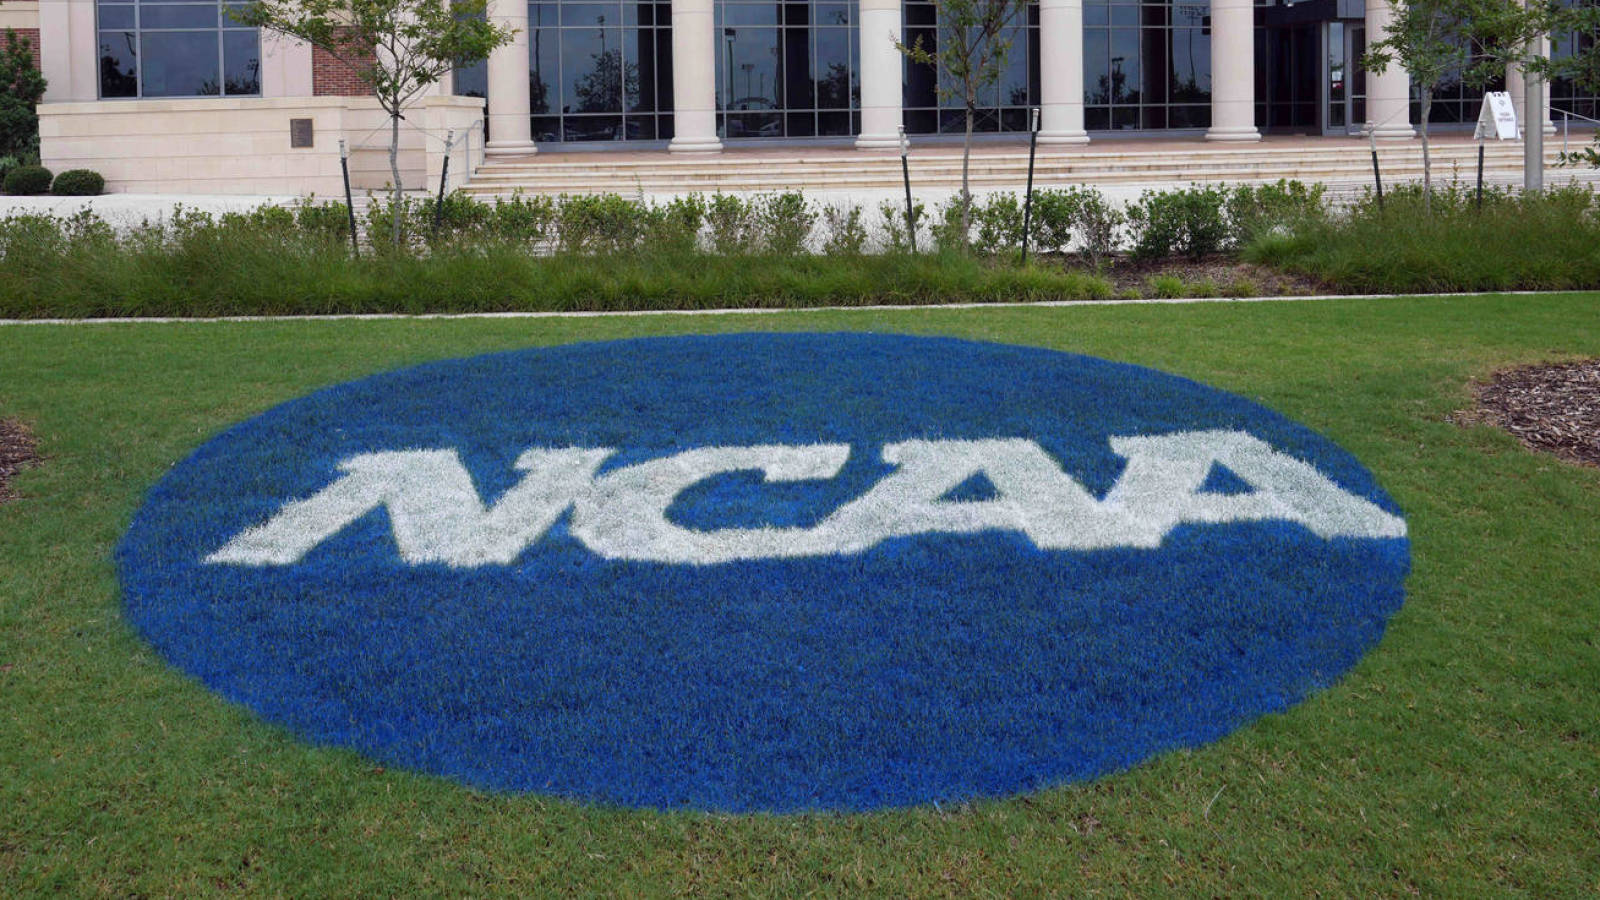 NCAA student-athletes can start earning money via name, image and likeness dealsZac Wassink, Yardbarker